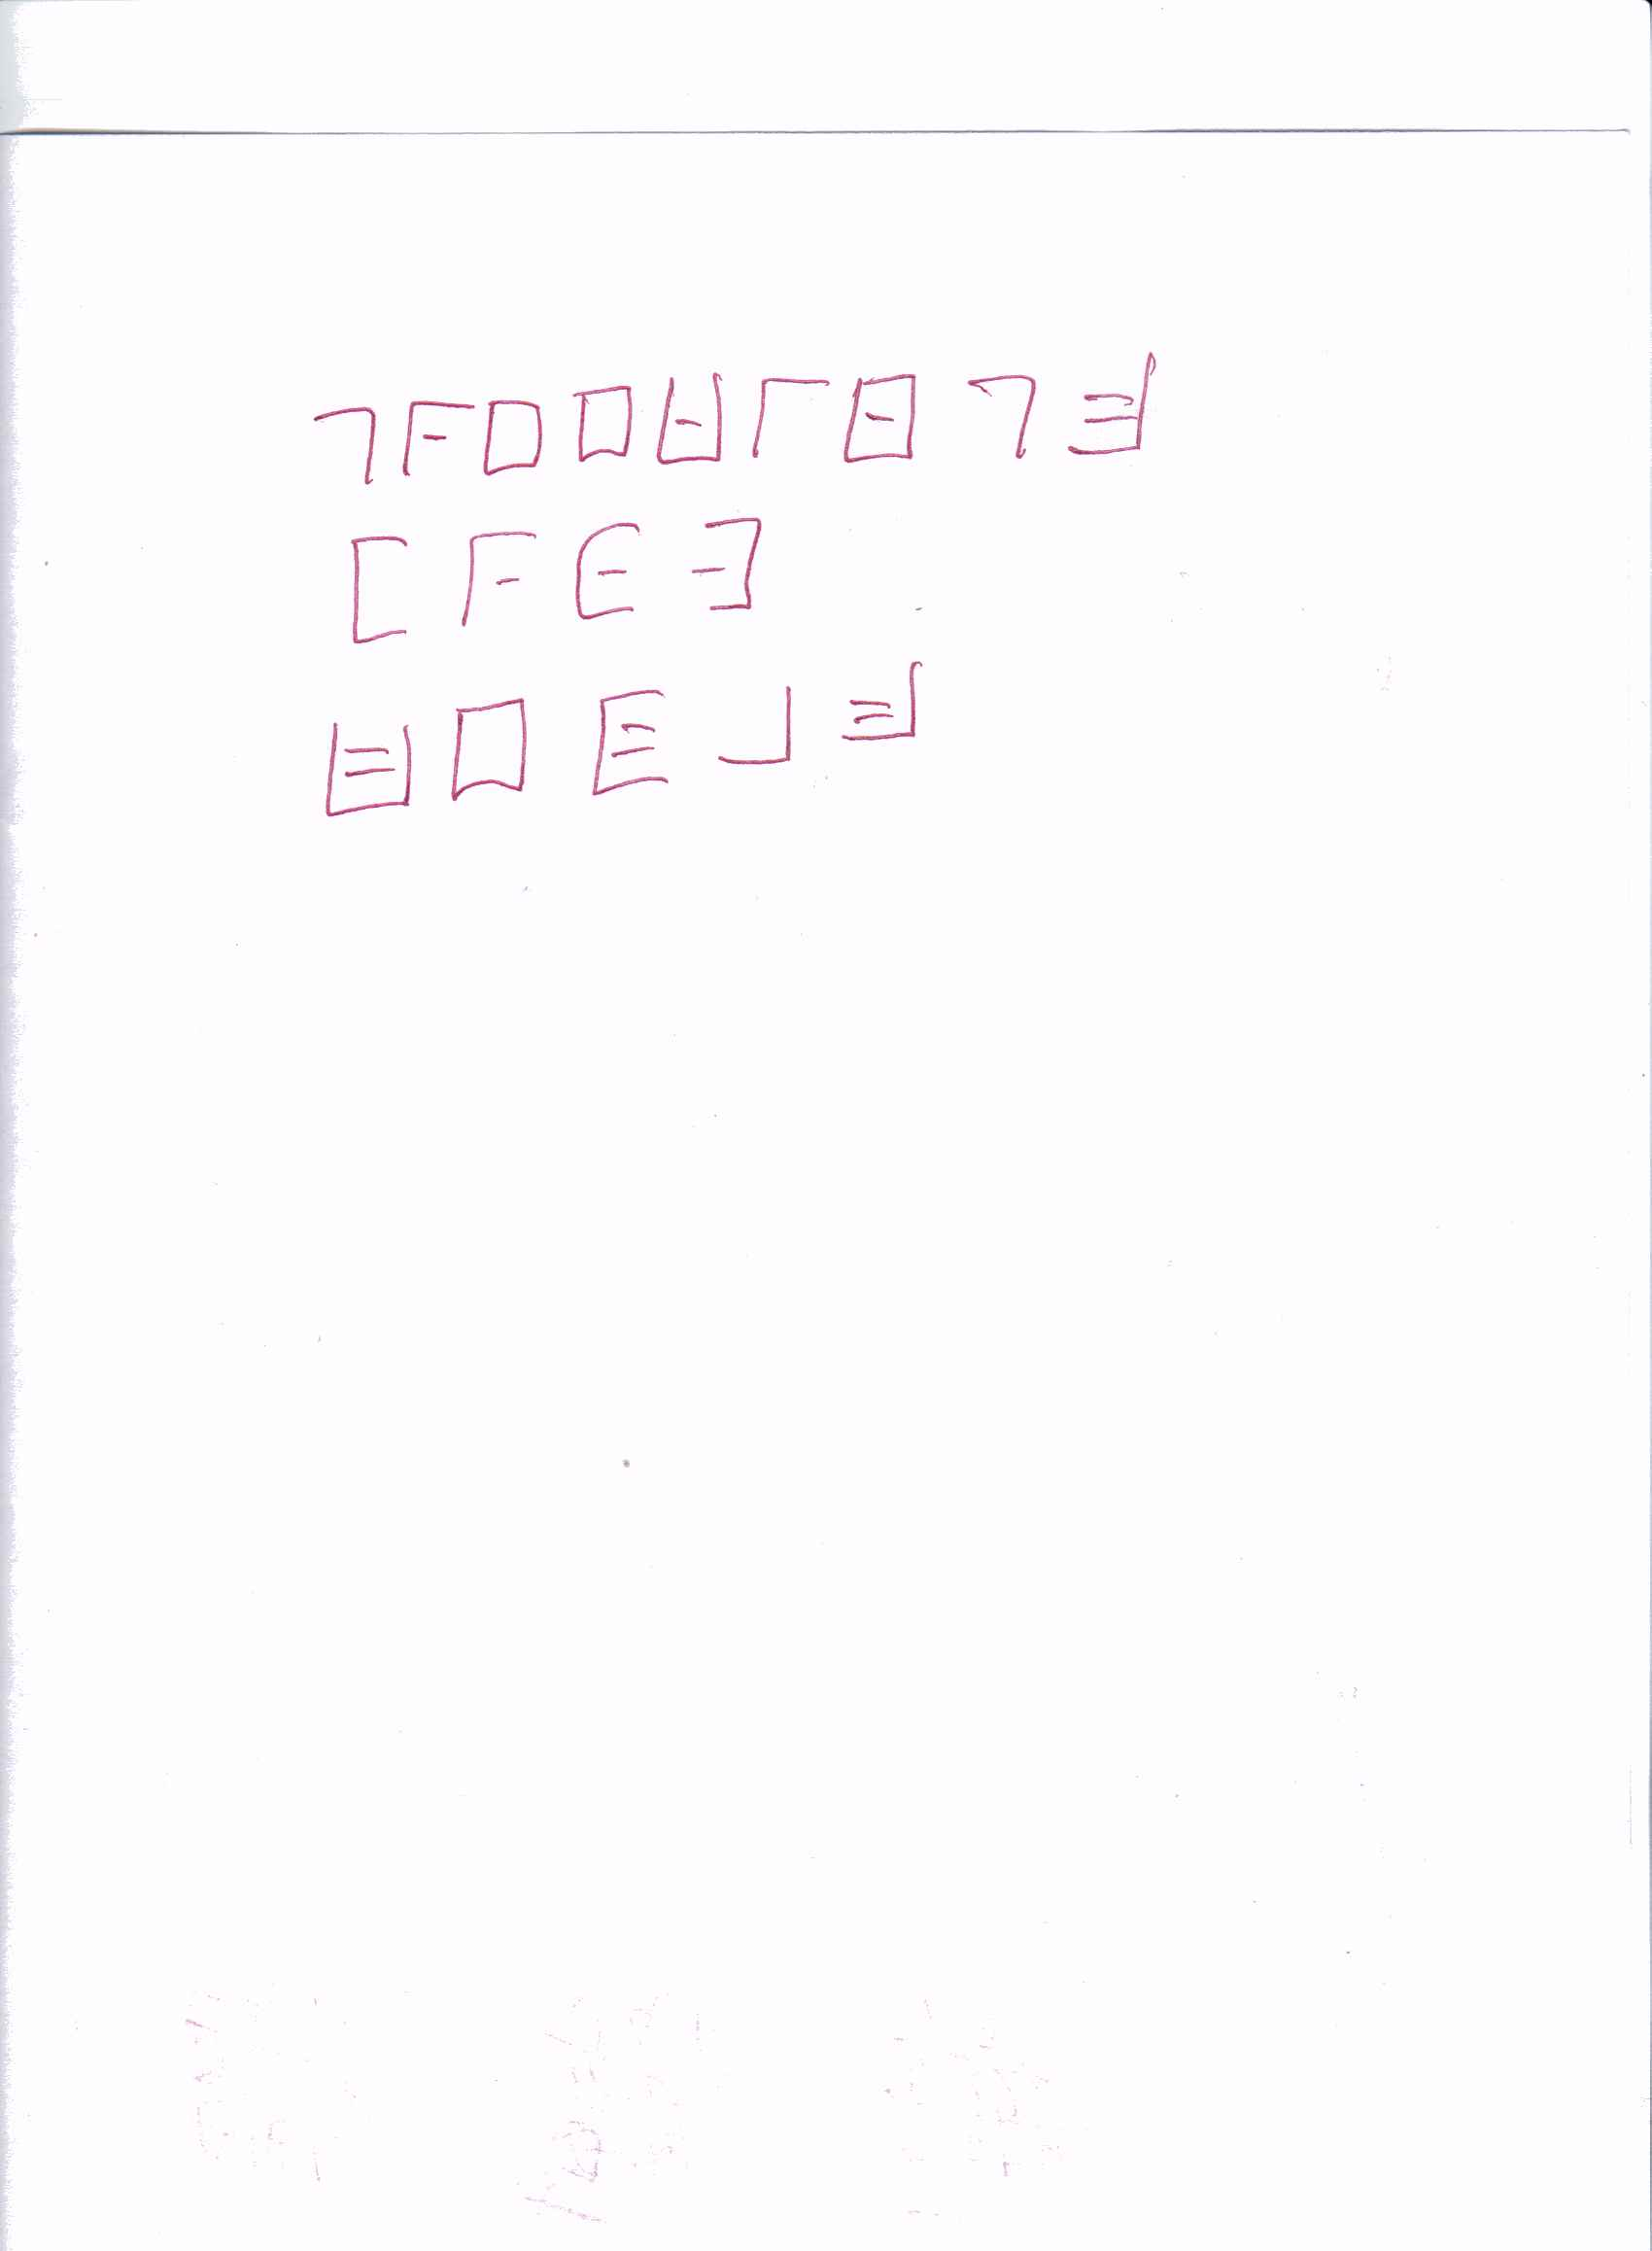 Basic Cryptology For Preppers-crypto.jpg